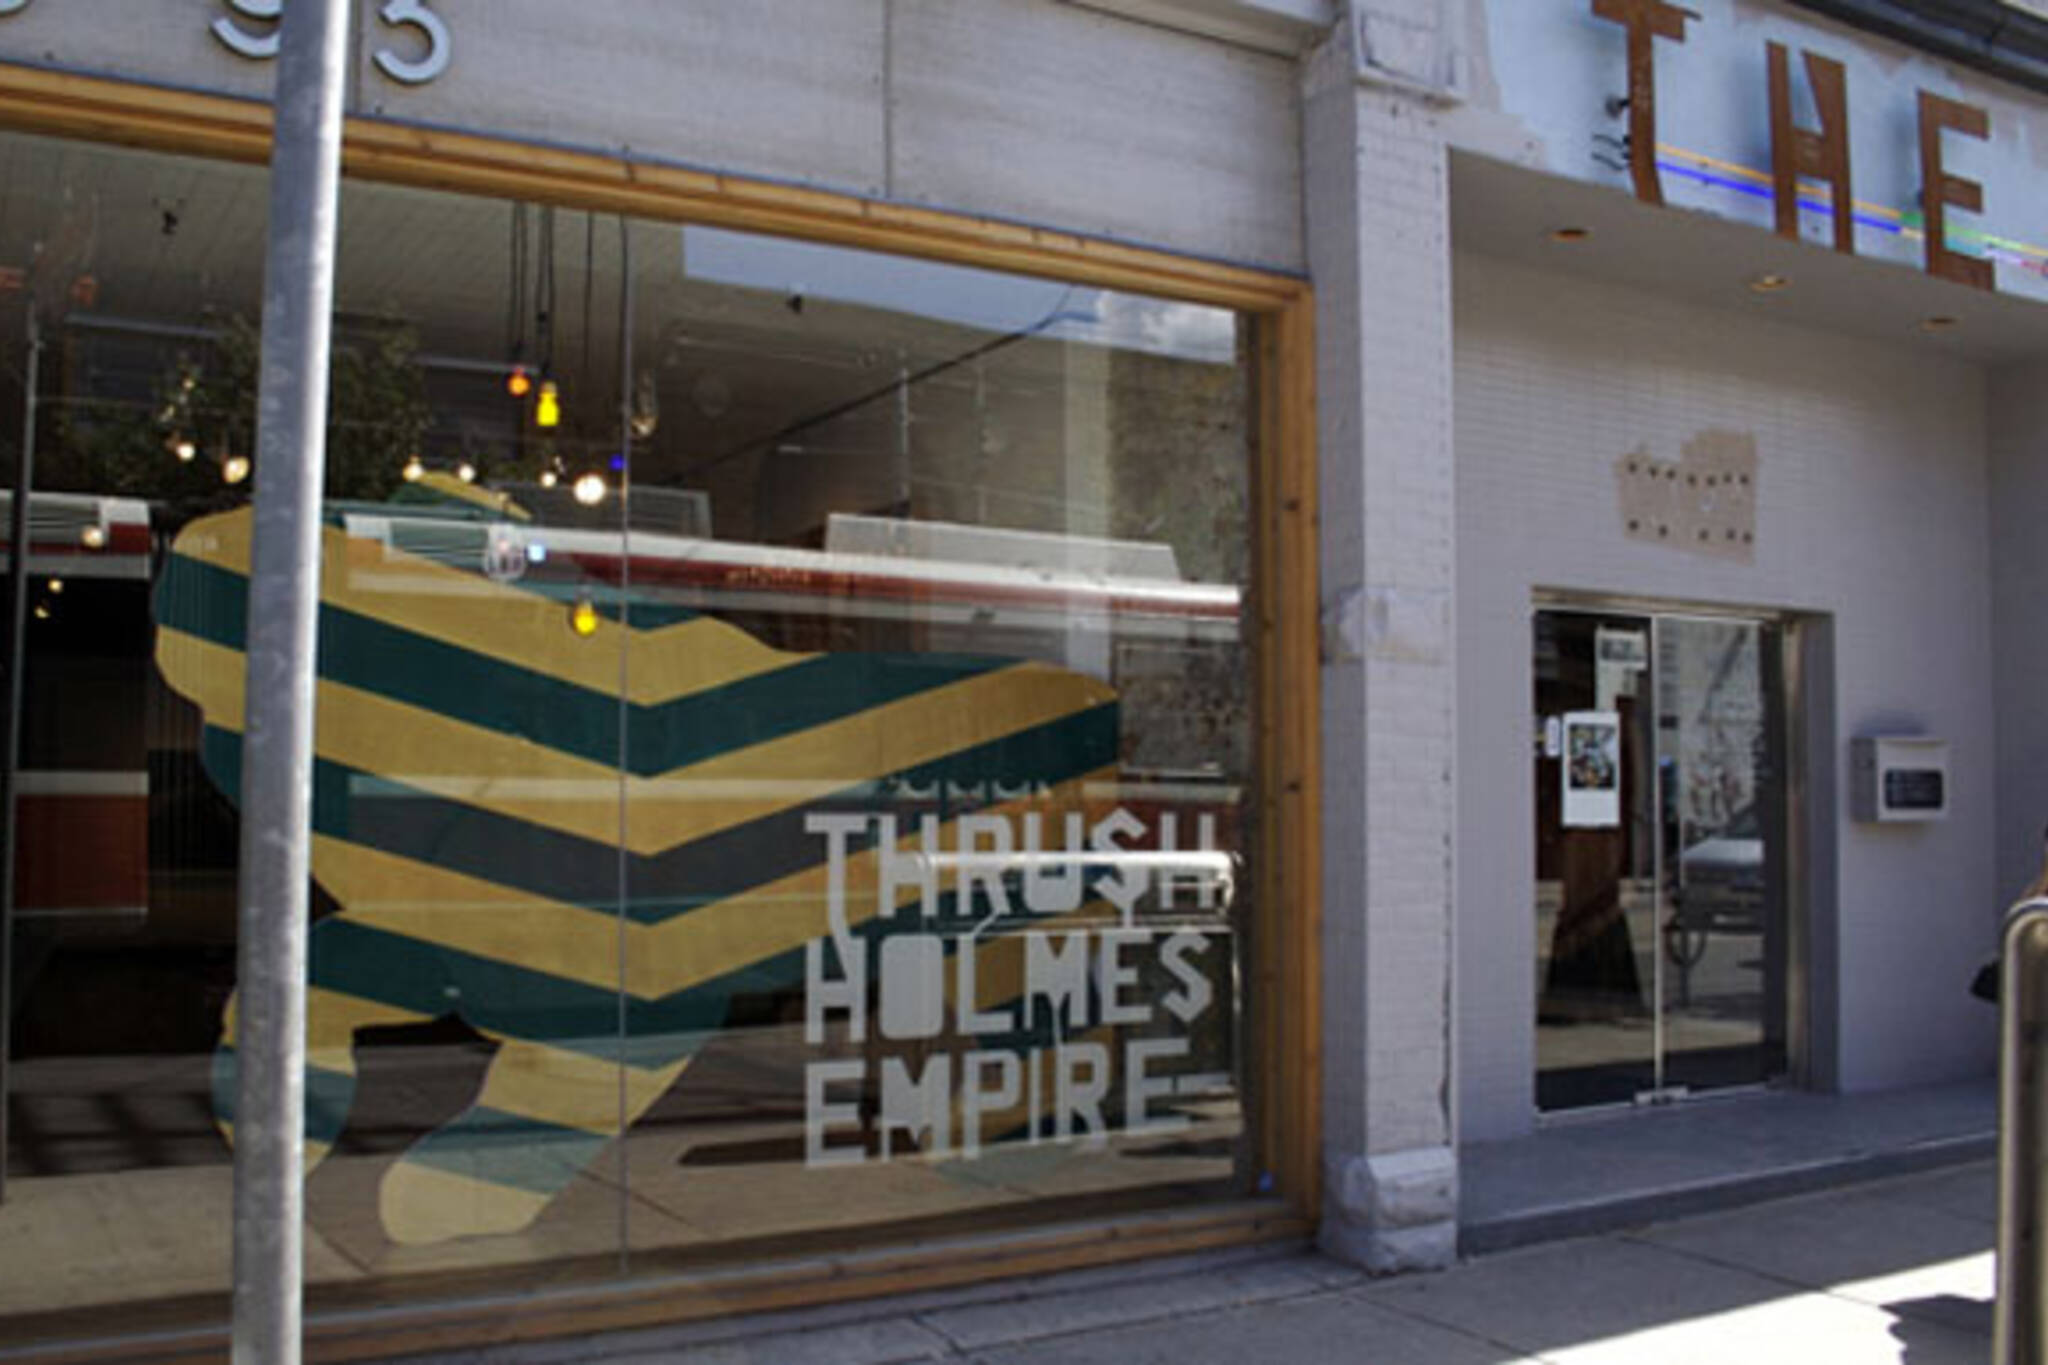 Thrush Holmes